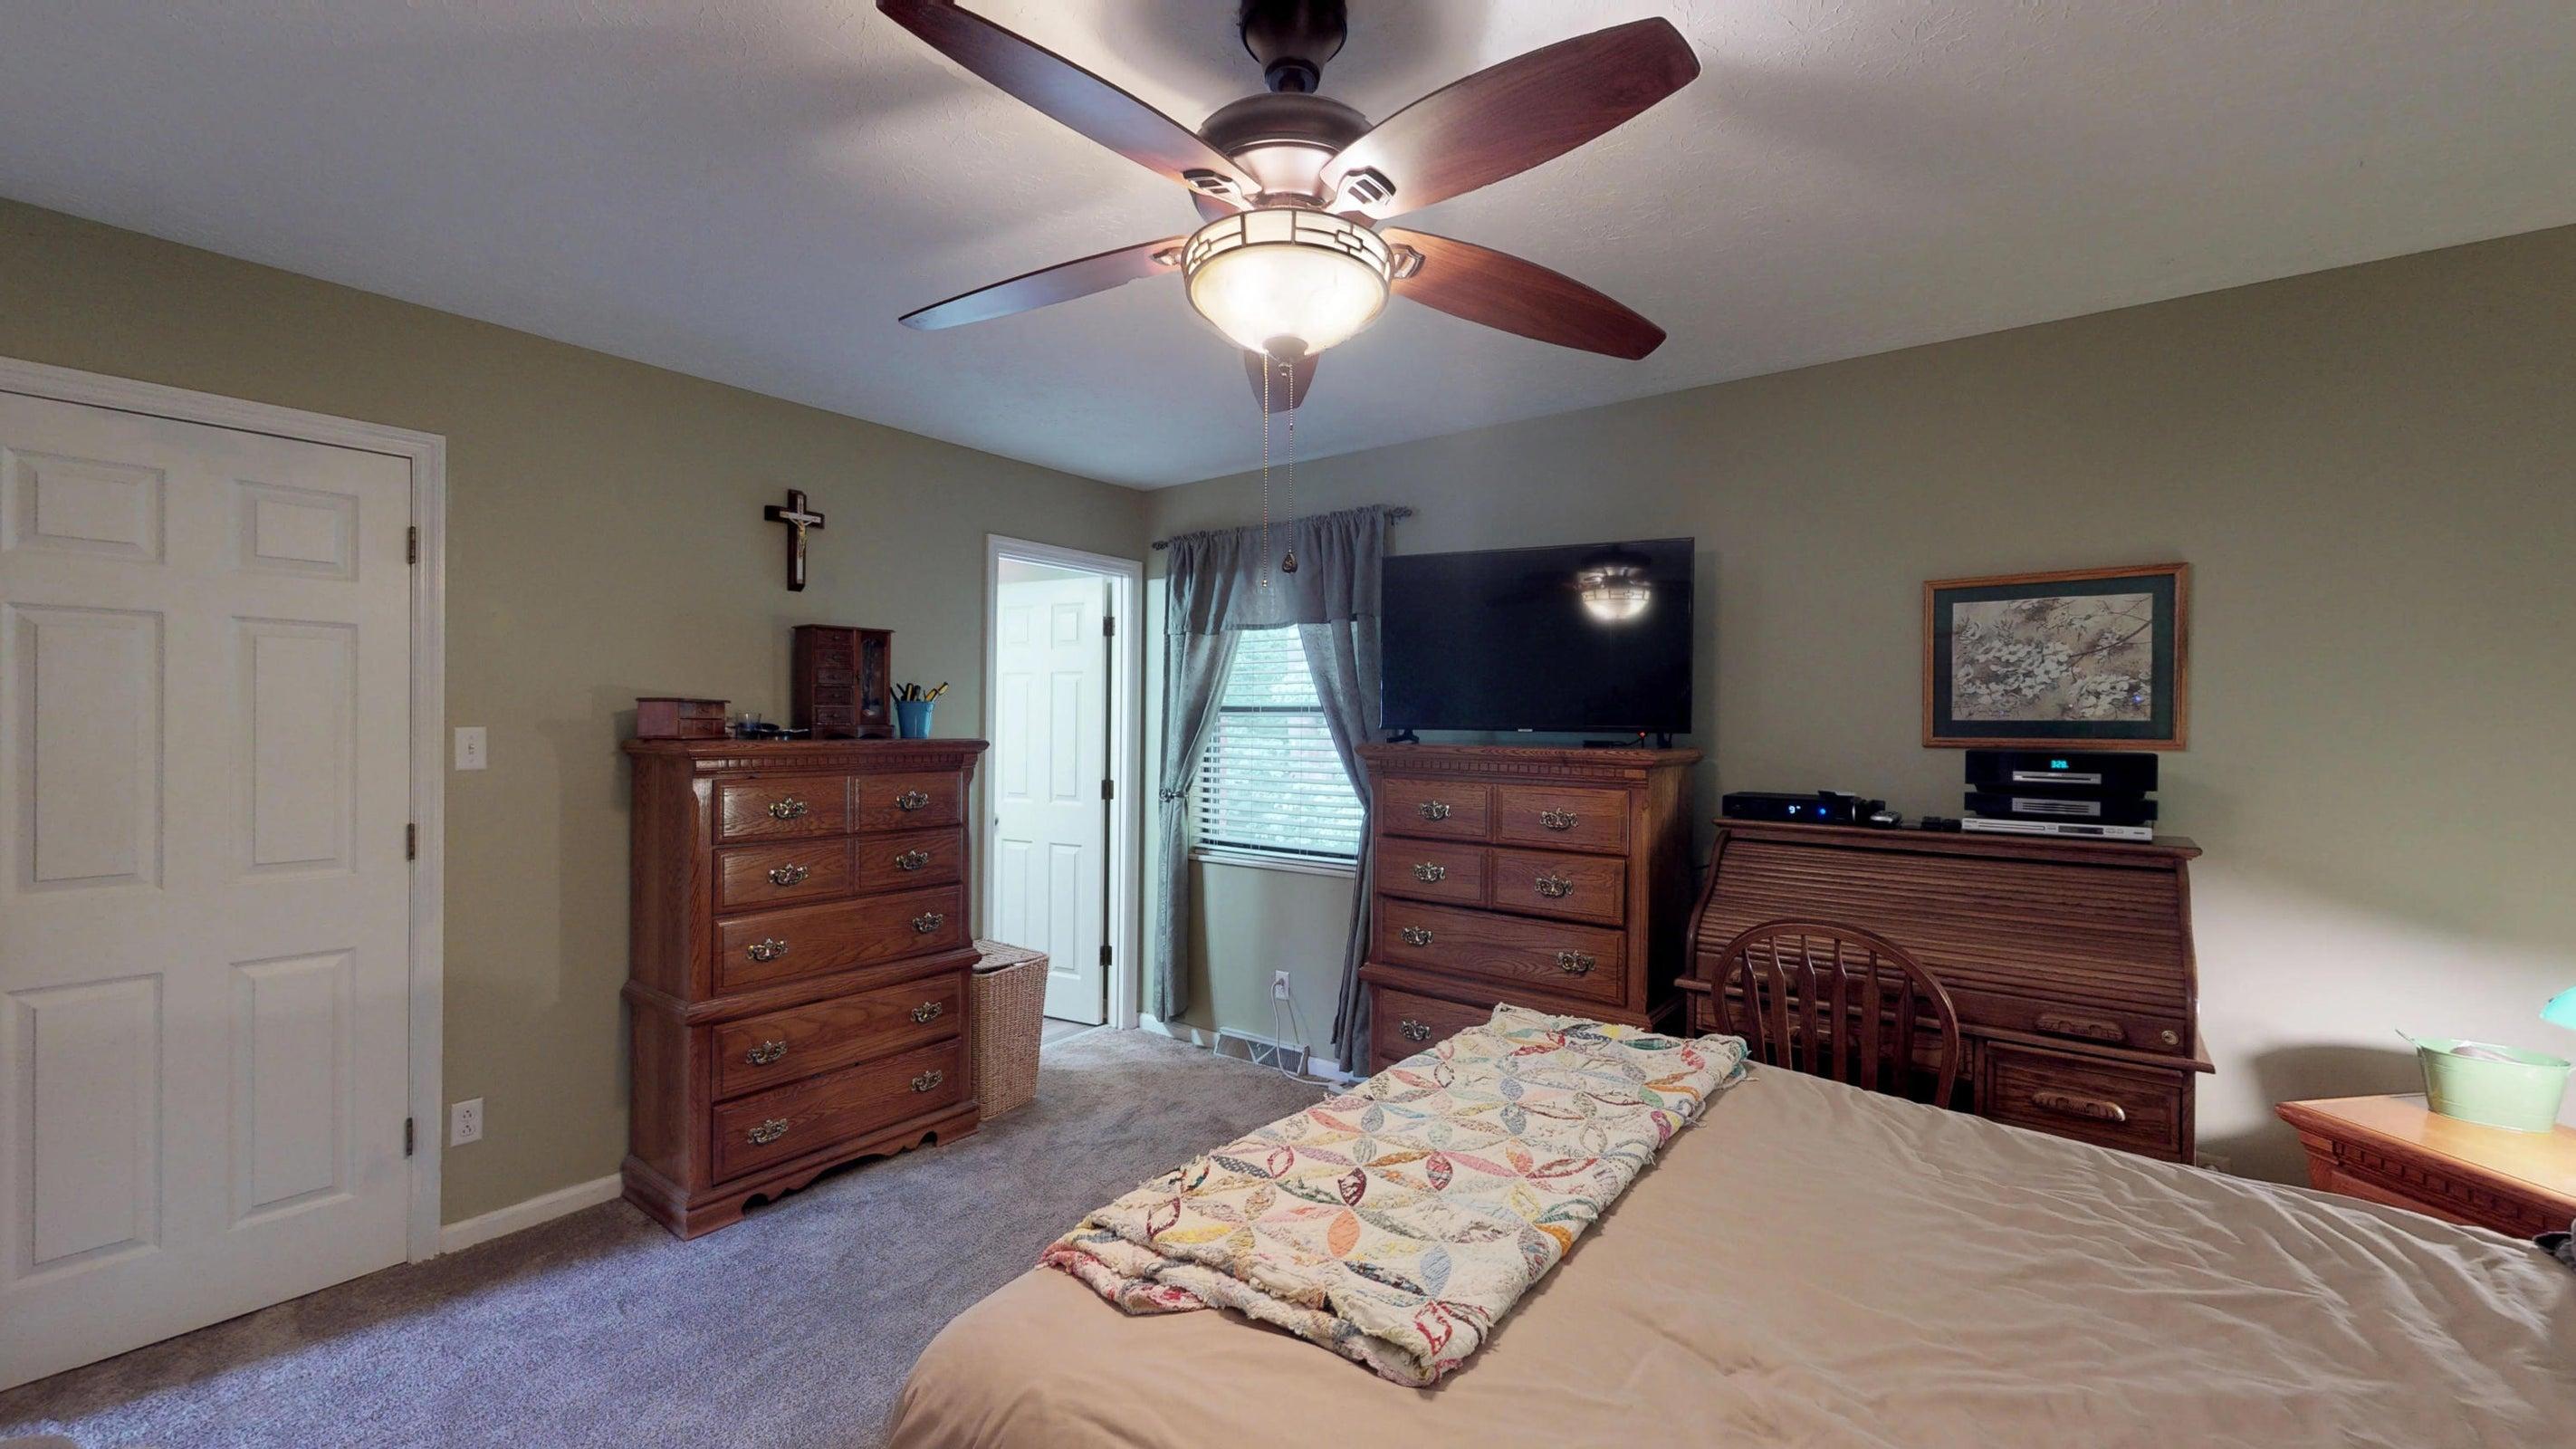 12521-Pony-Express-Dr-Master-Bedroom(1)